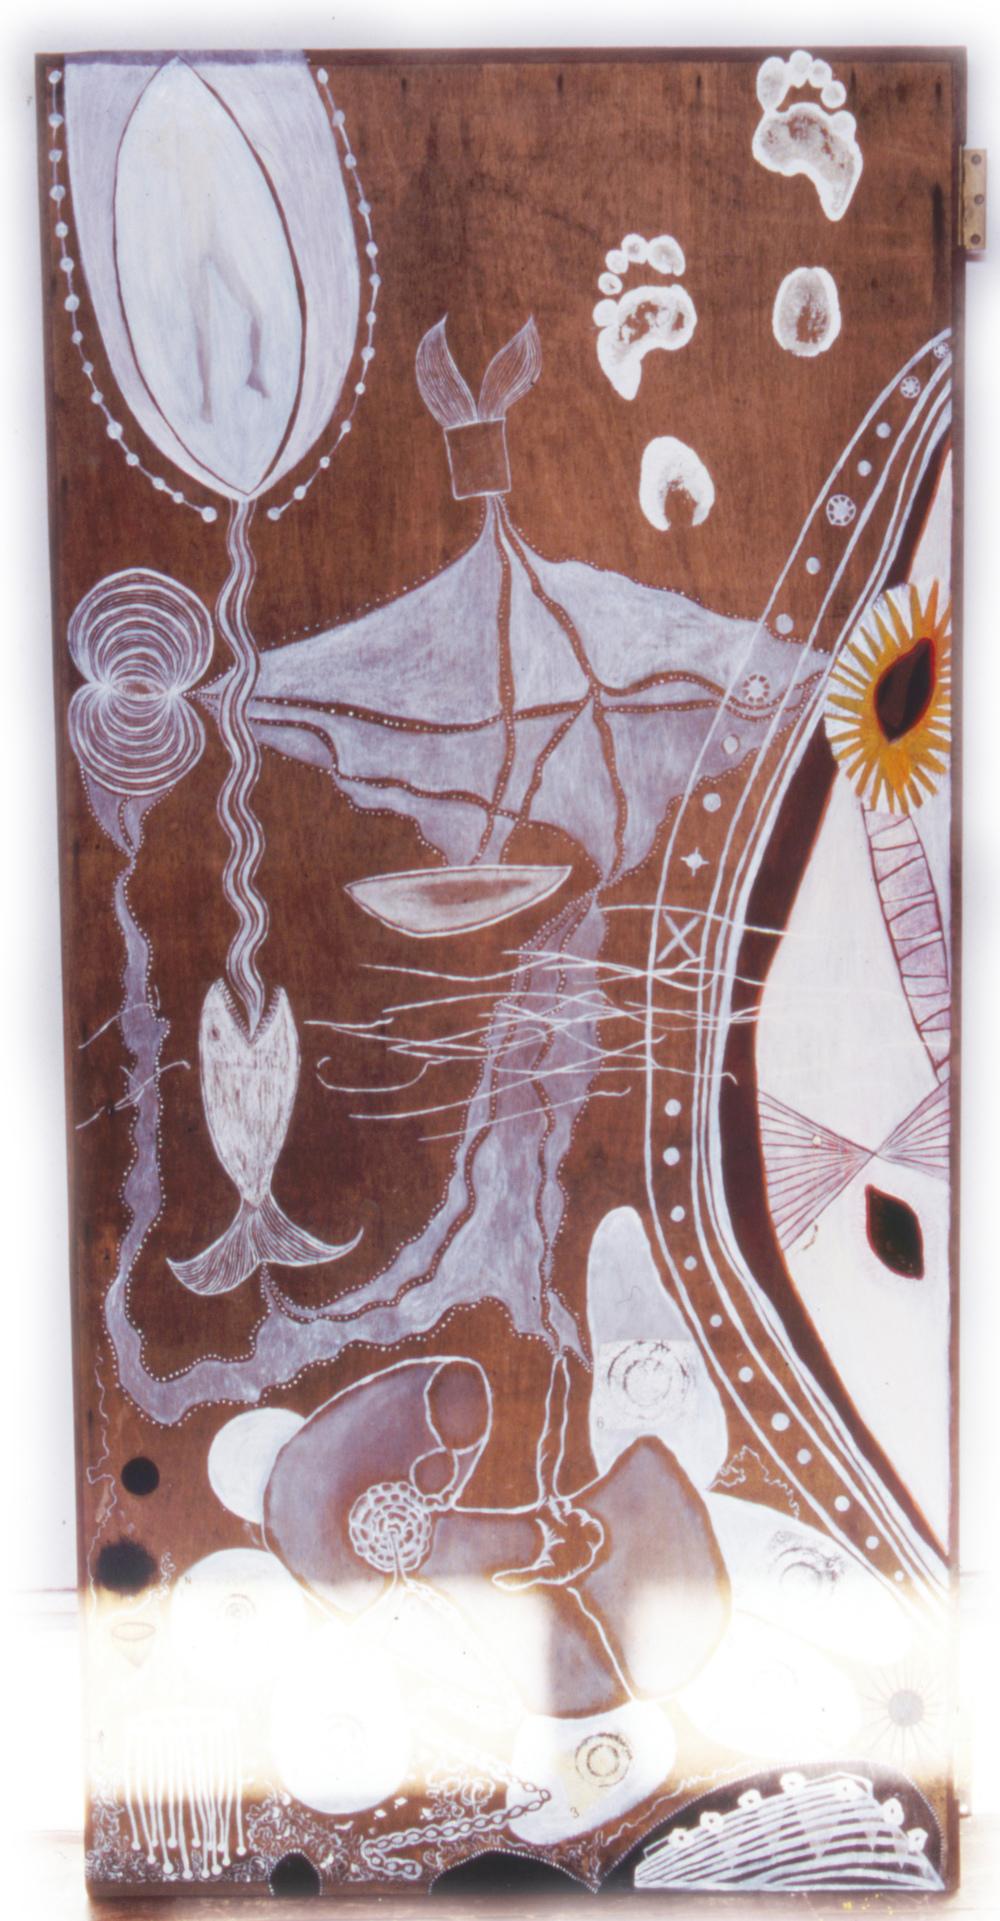 Light travels, 1996